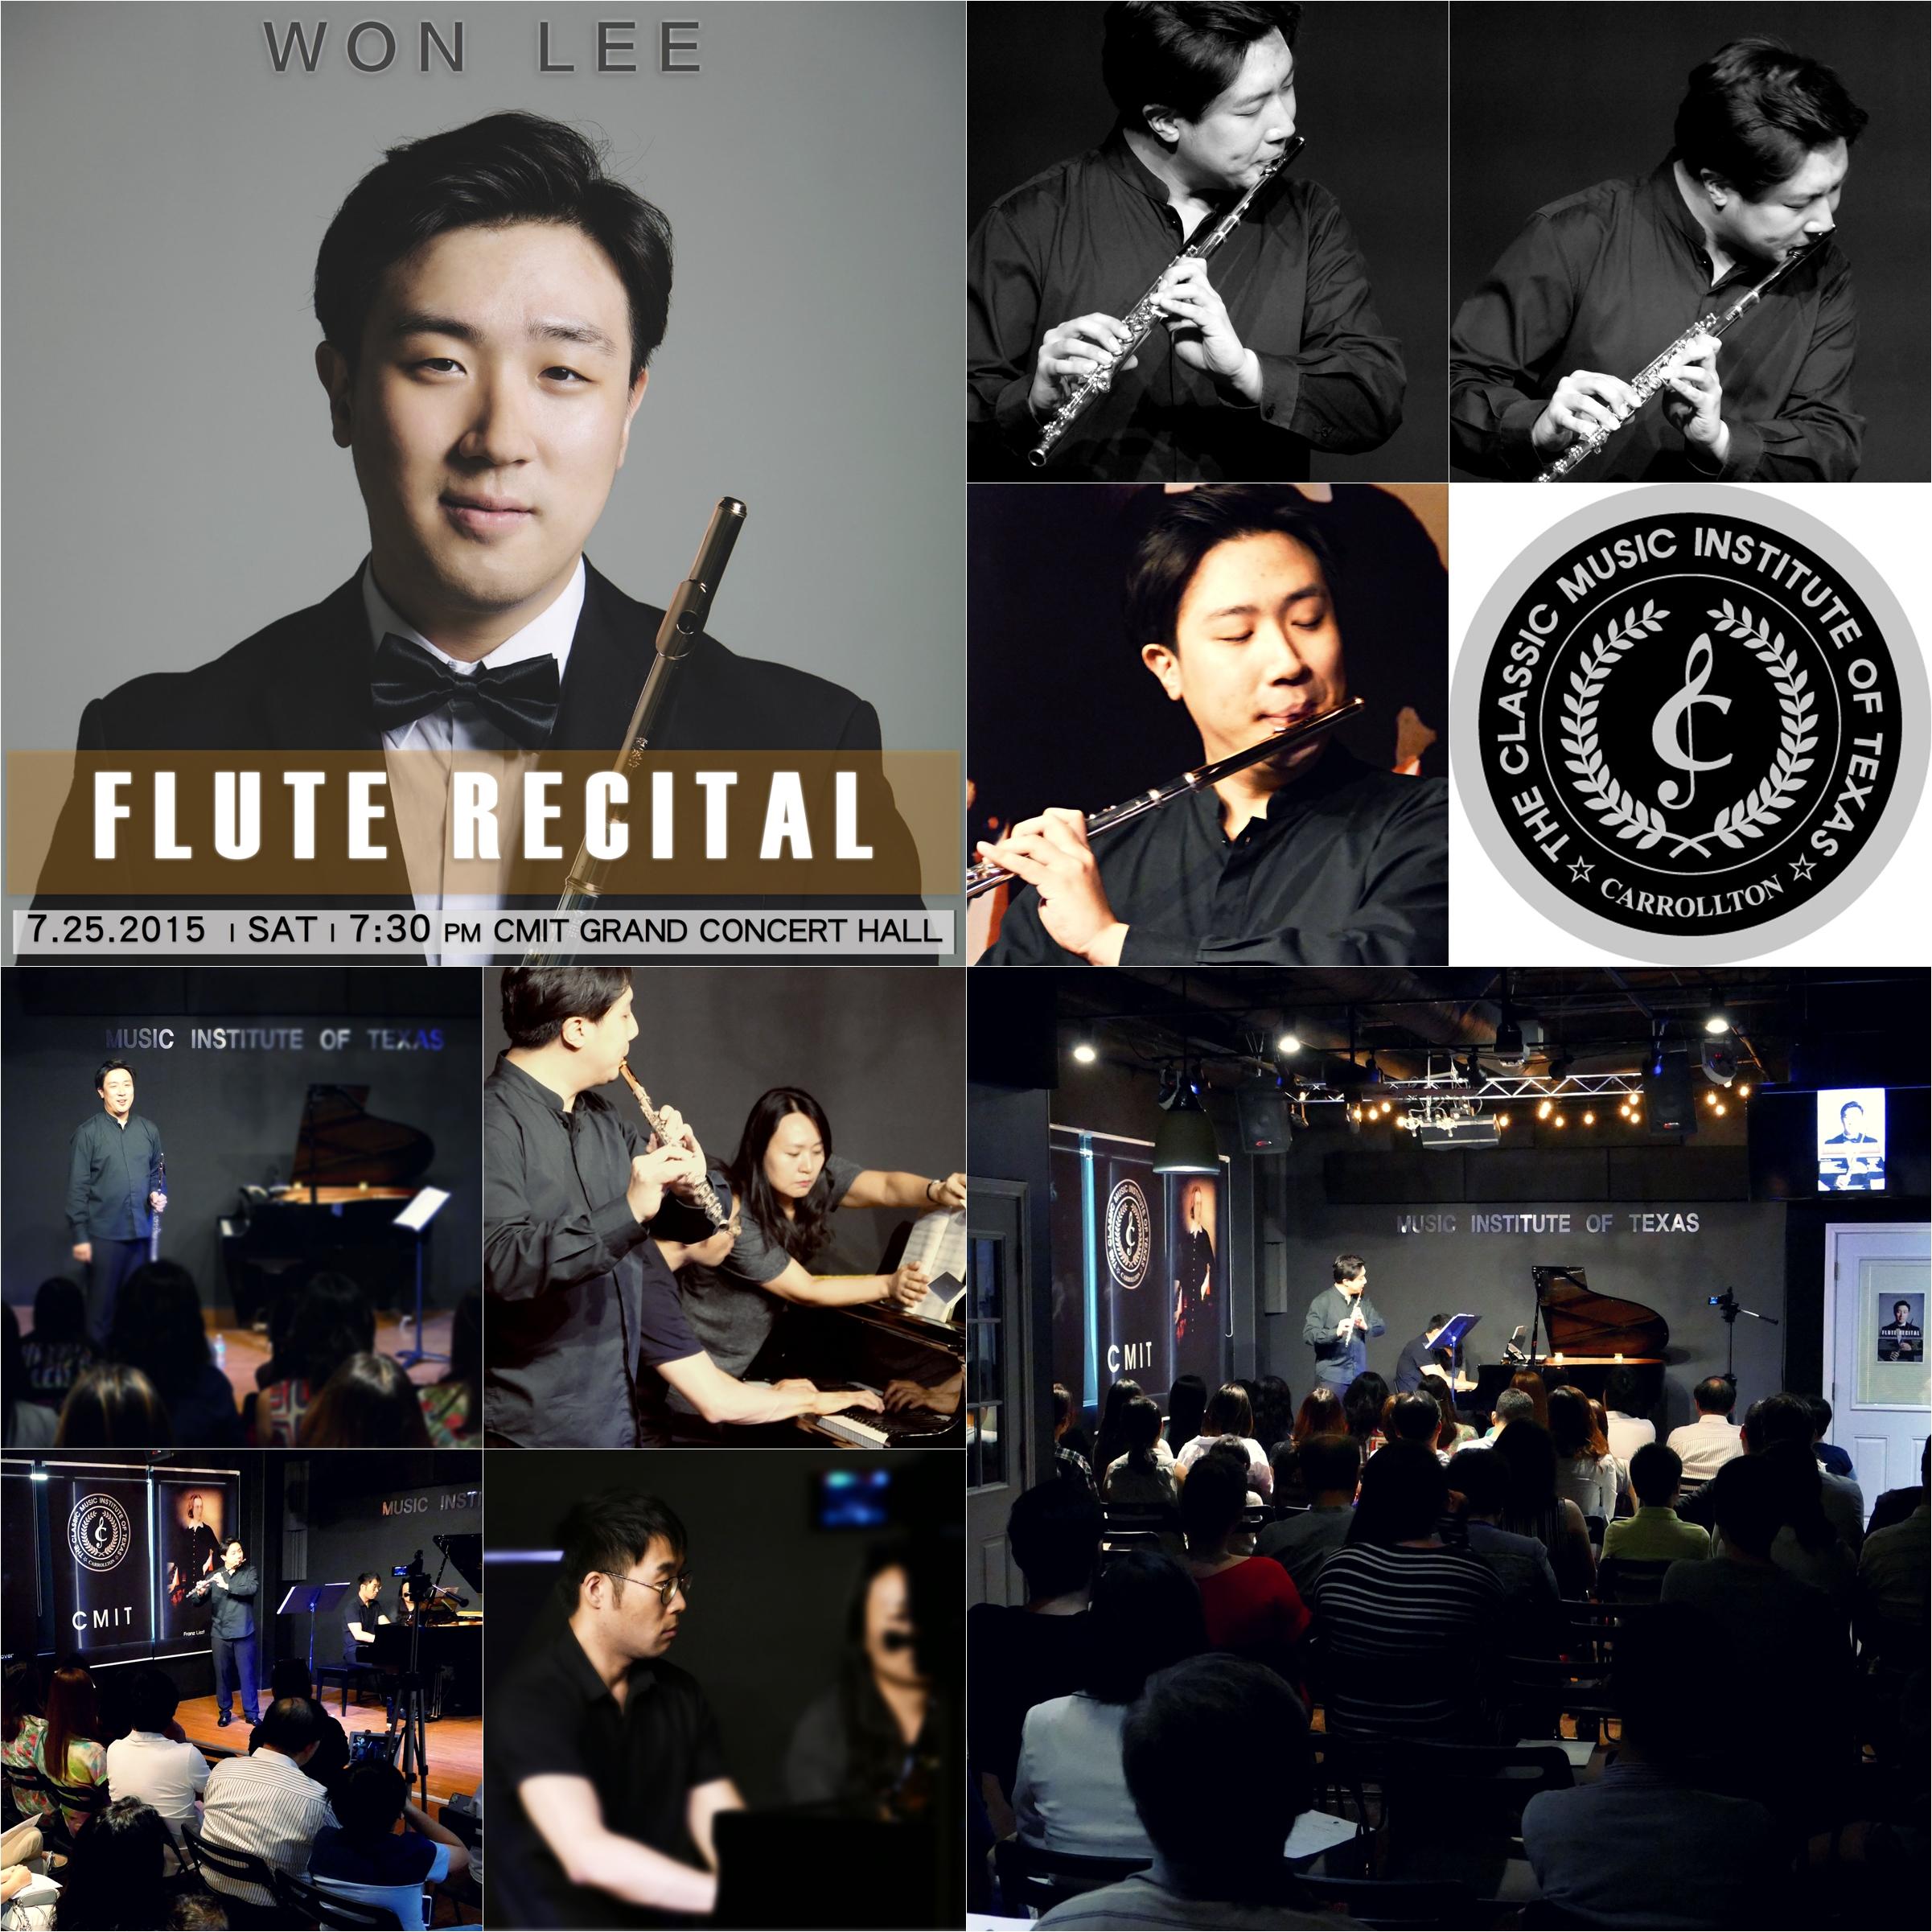 Won Lee Flute Recital 072515 page01.jpg